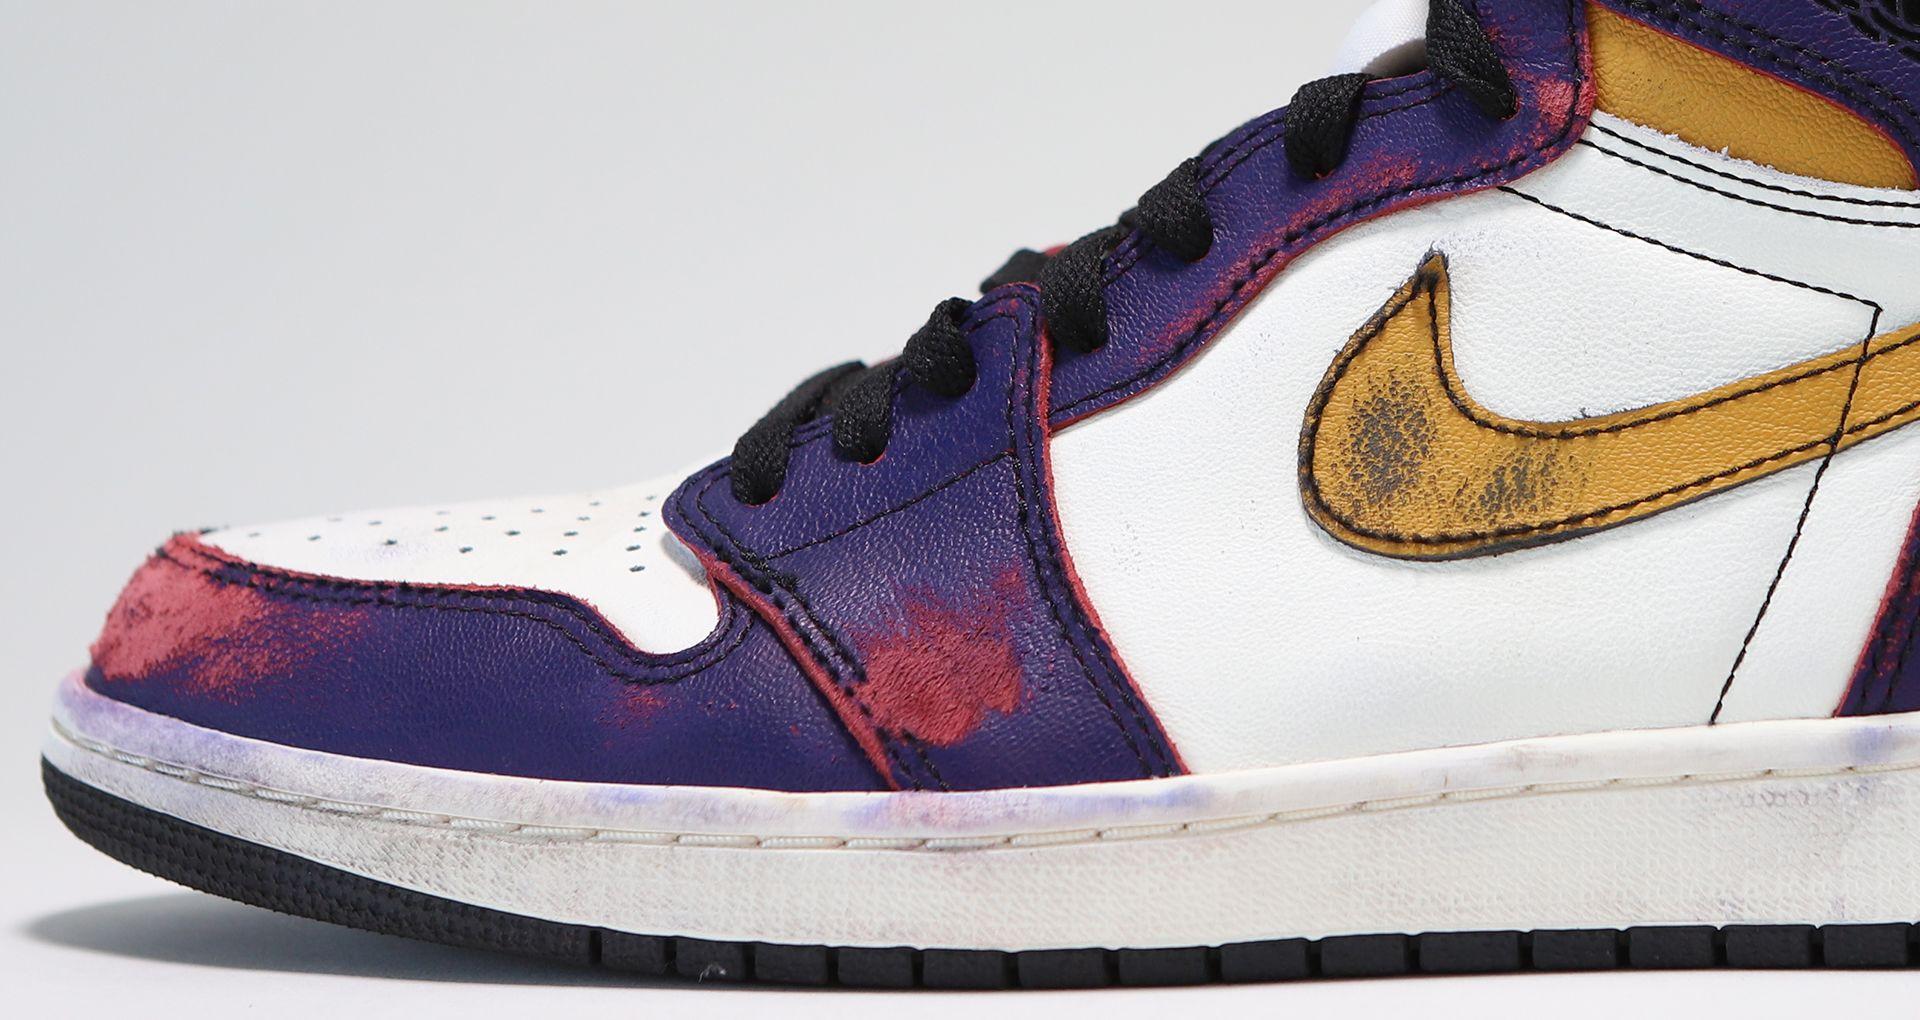 'la 1 To Chicago' DateNike Air Jordan Release rtsdChQ